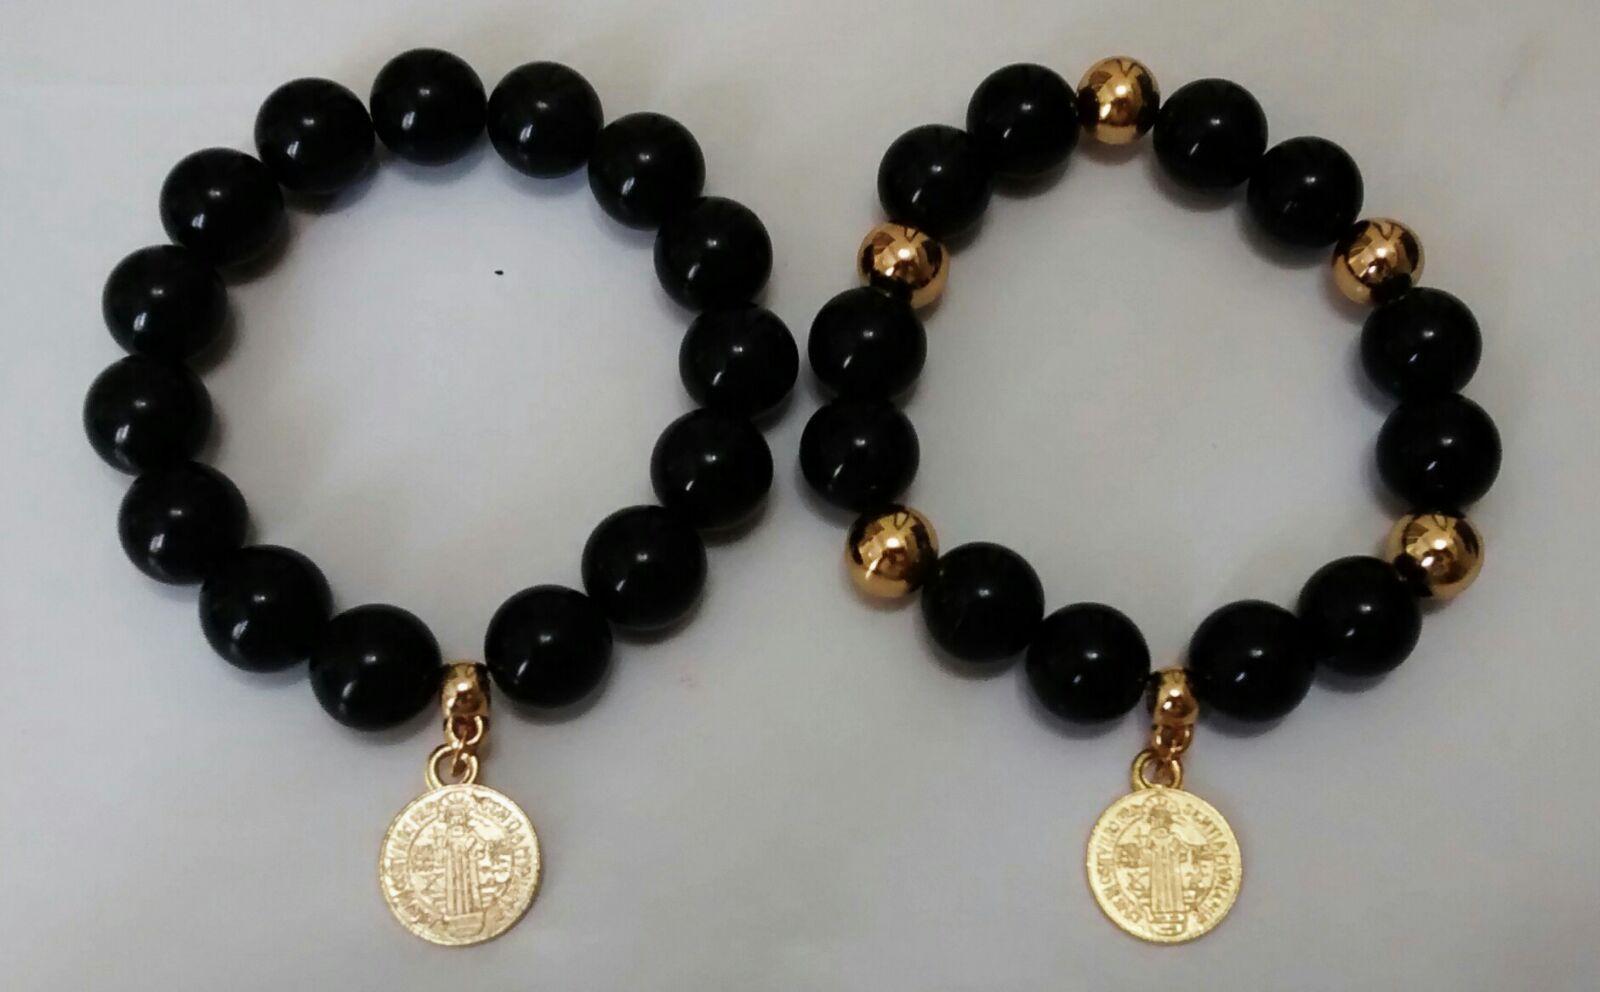 4fc87585344e Pulseras en turmalina negra, medalla de San Benito. | pulseras ...